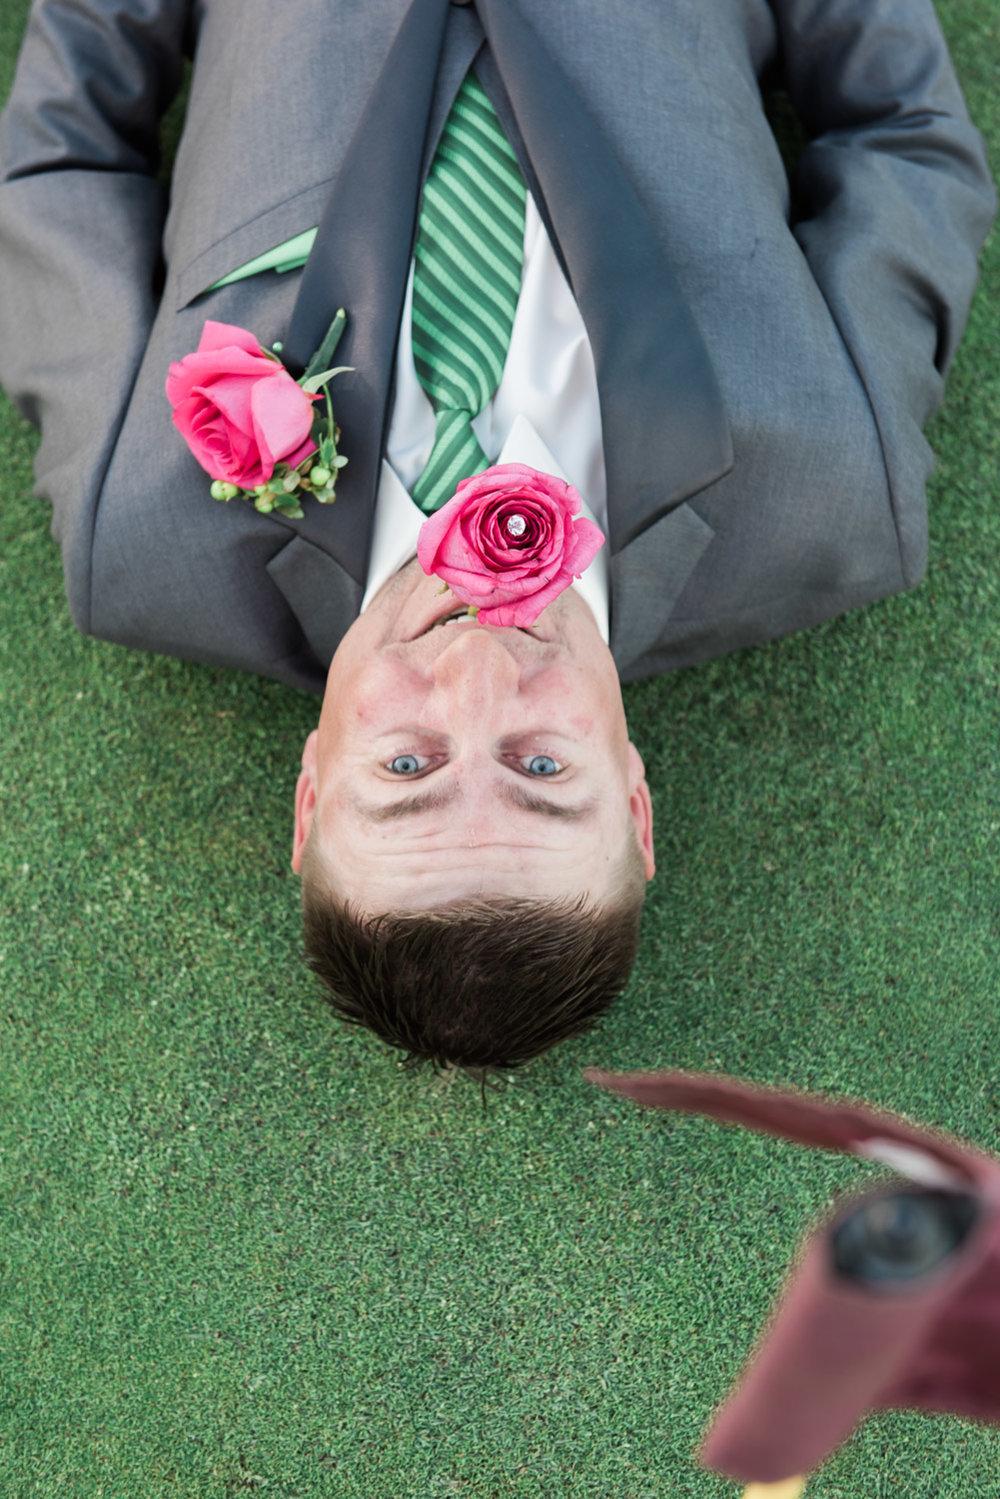 groom-on-the-golf-course-wedding-photos-afewgoodclicks-net